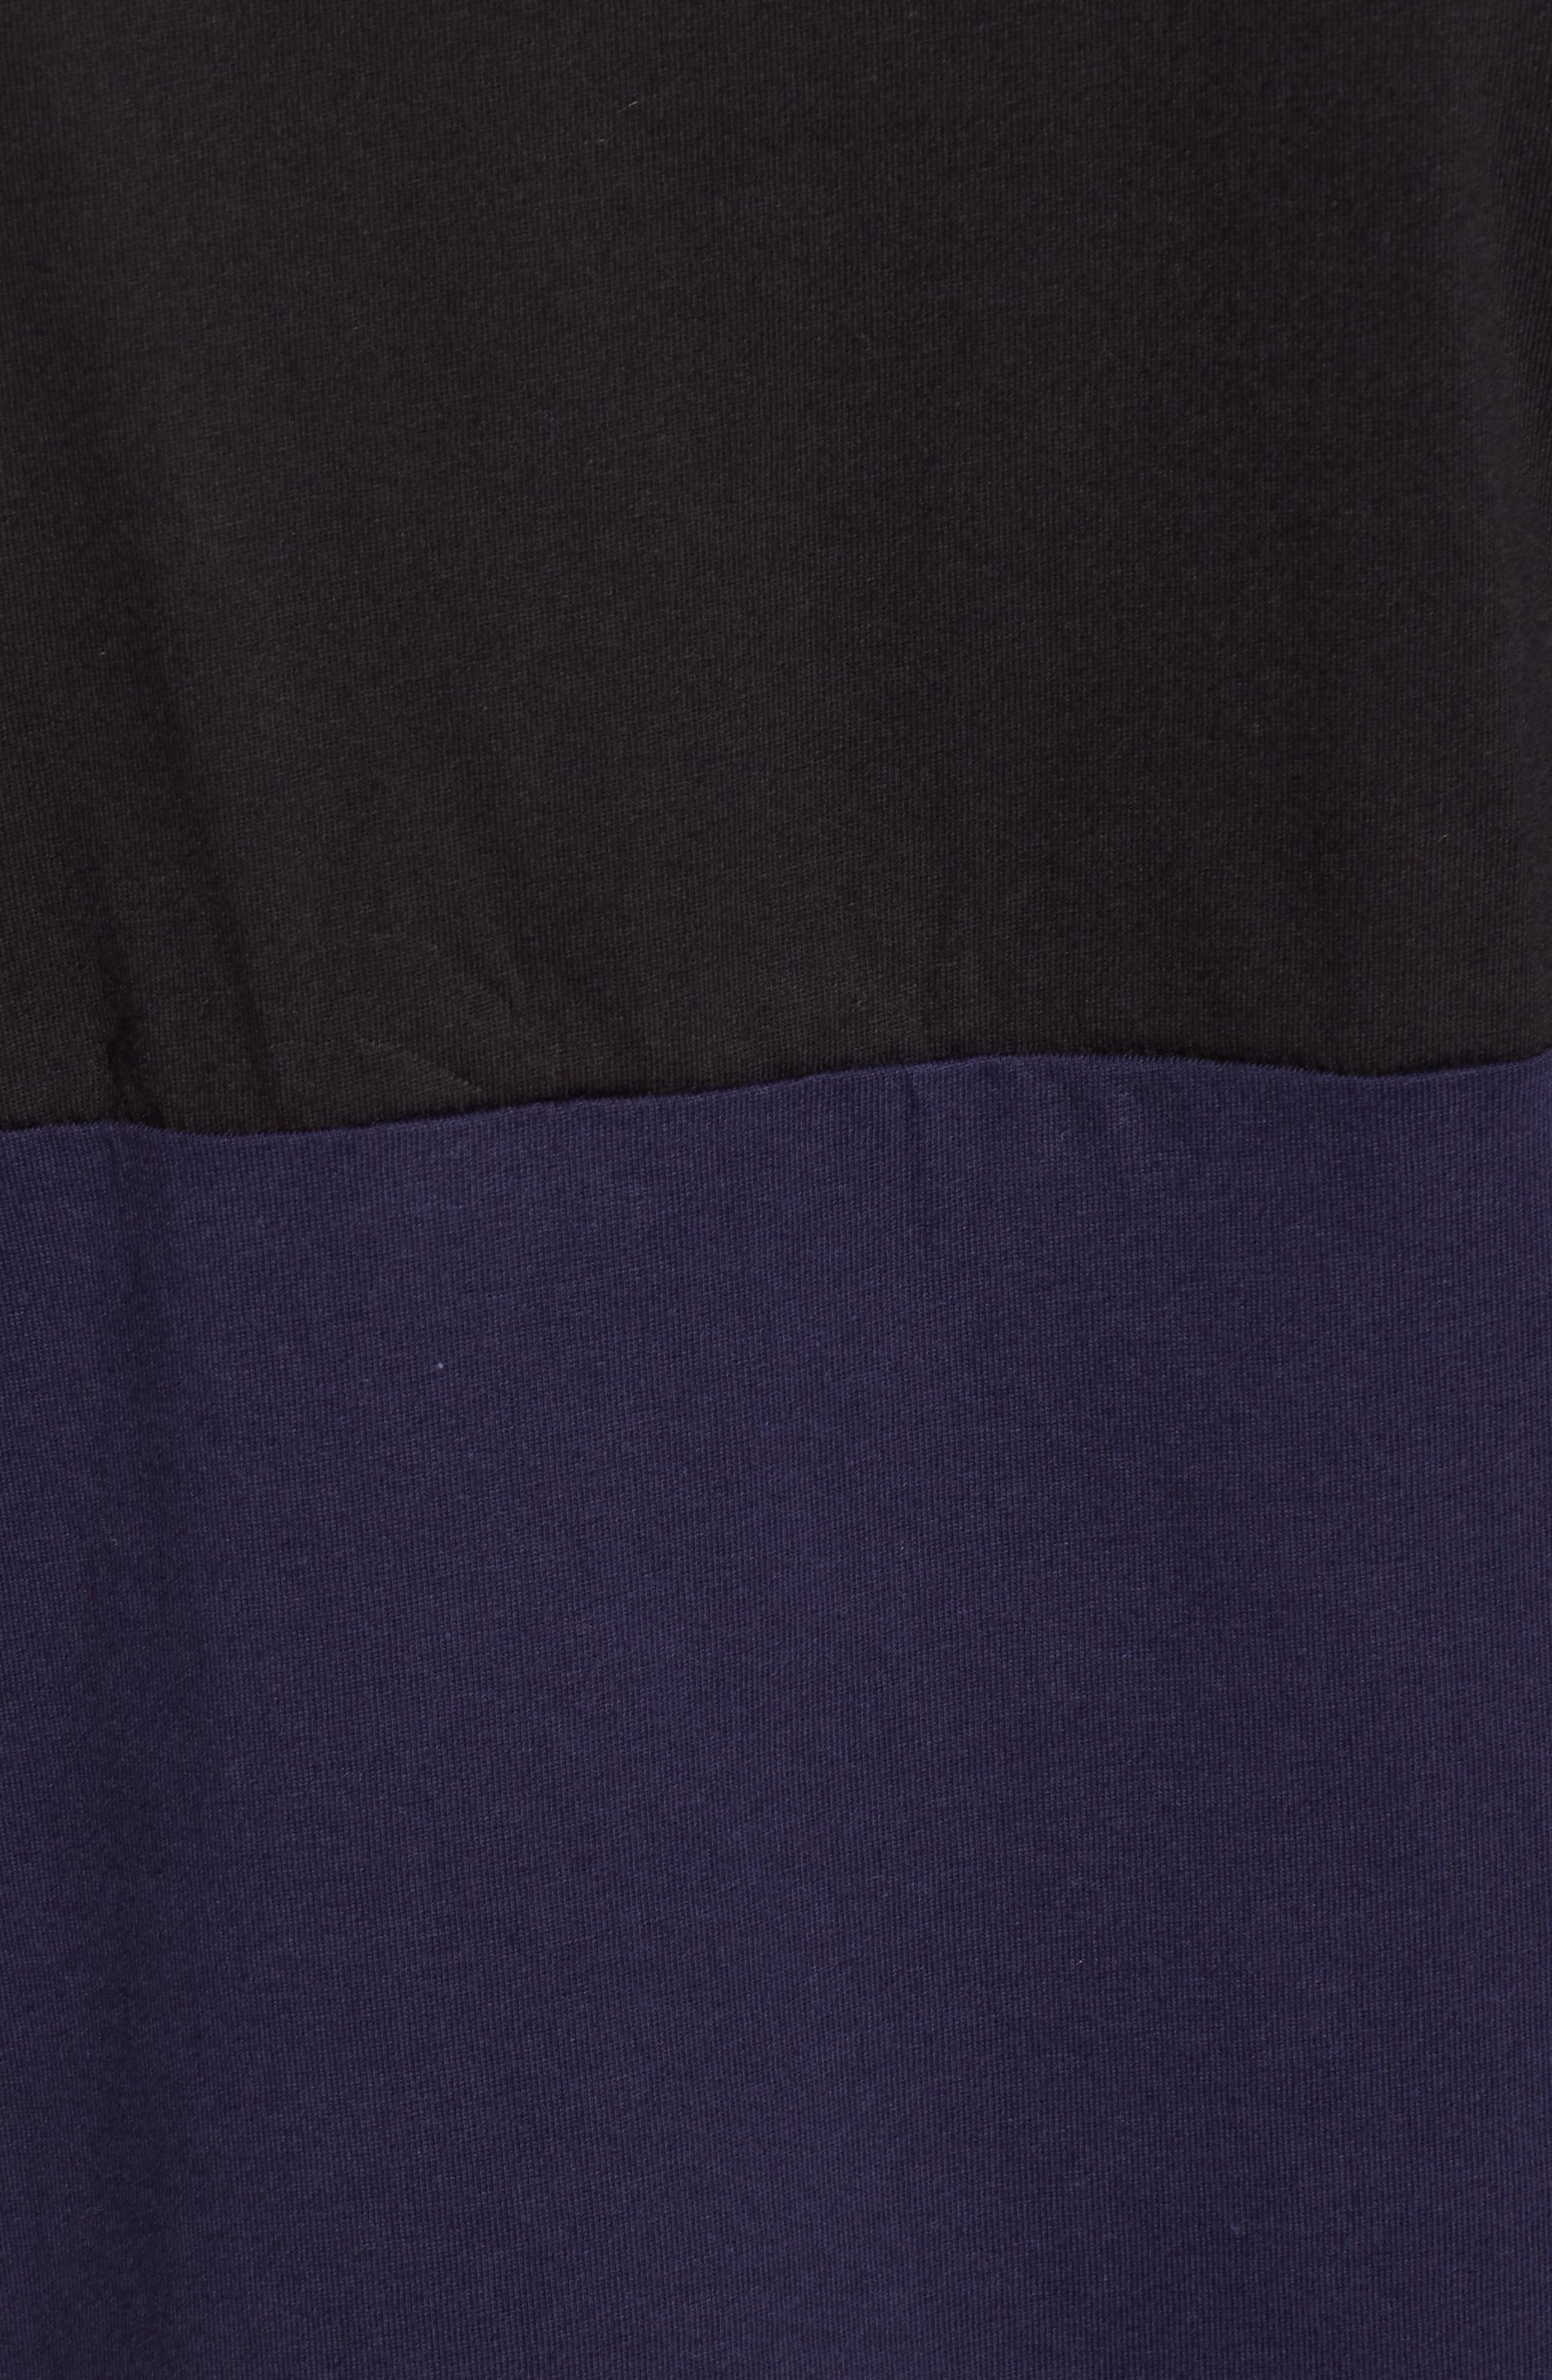 Half Stripe Crewneck T-Shirt,                             Alternate thumbnail 5, color,